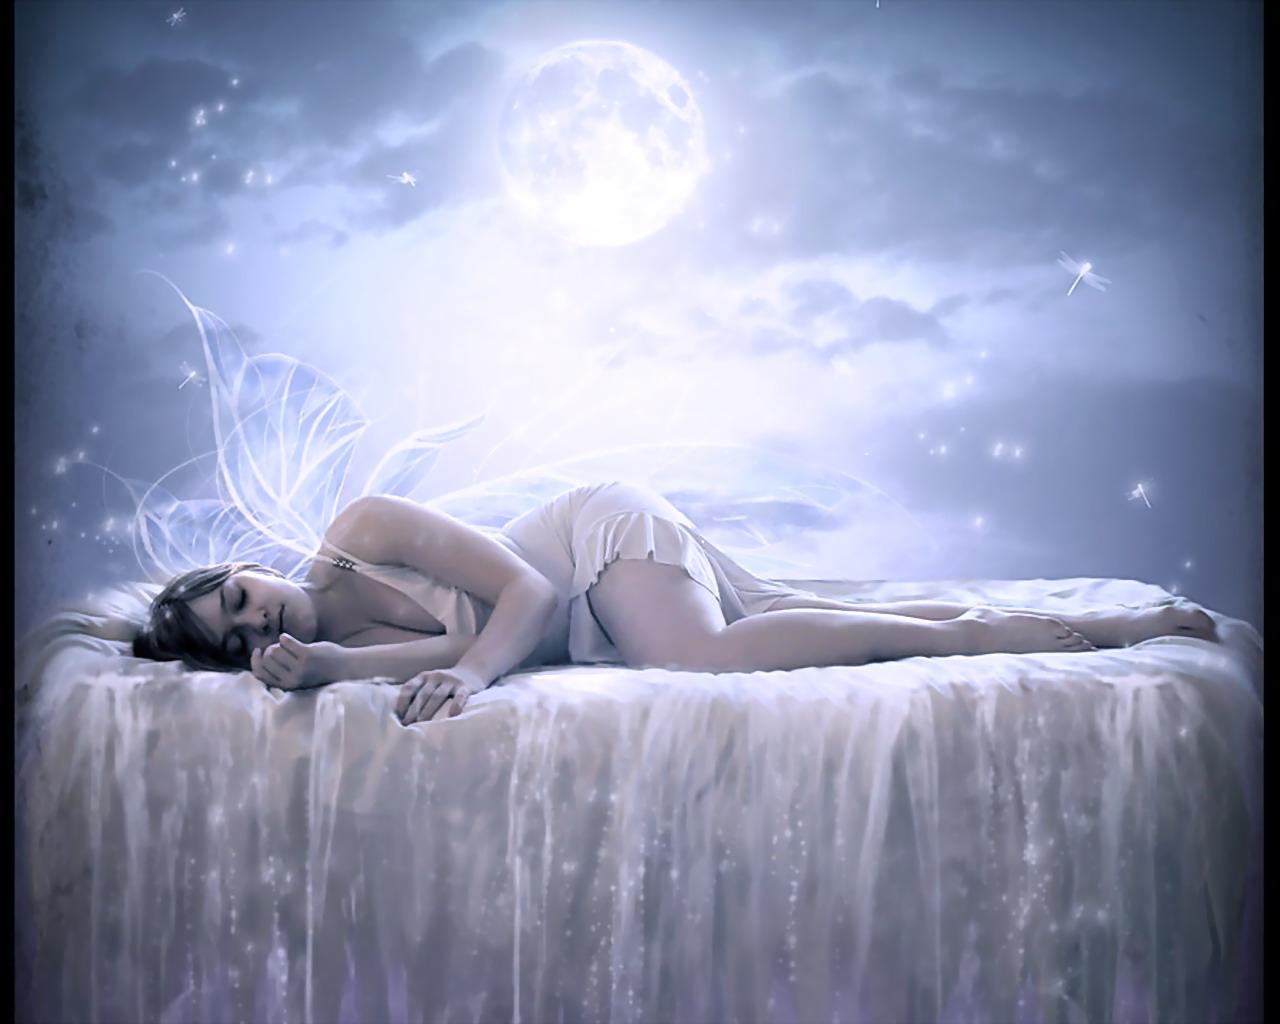 Толкования сновидений по соннику Ванги